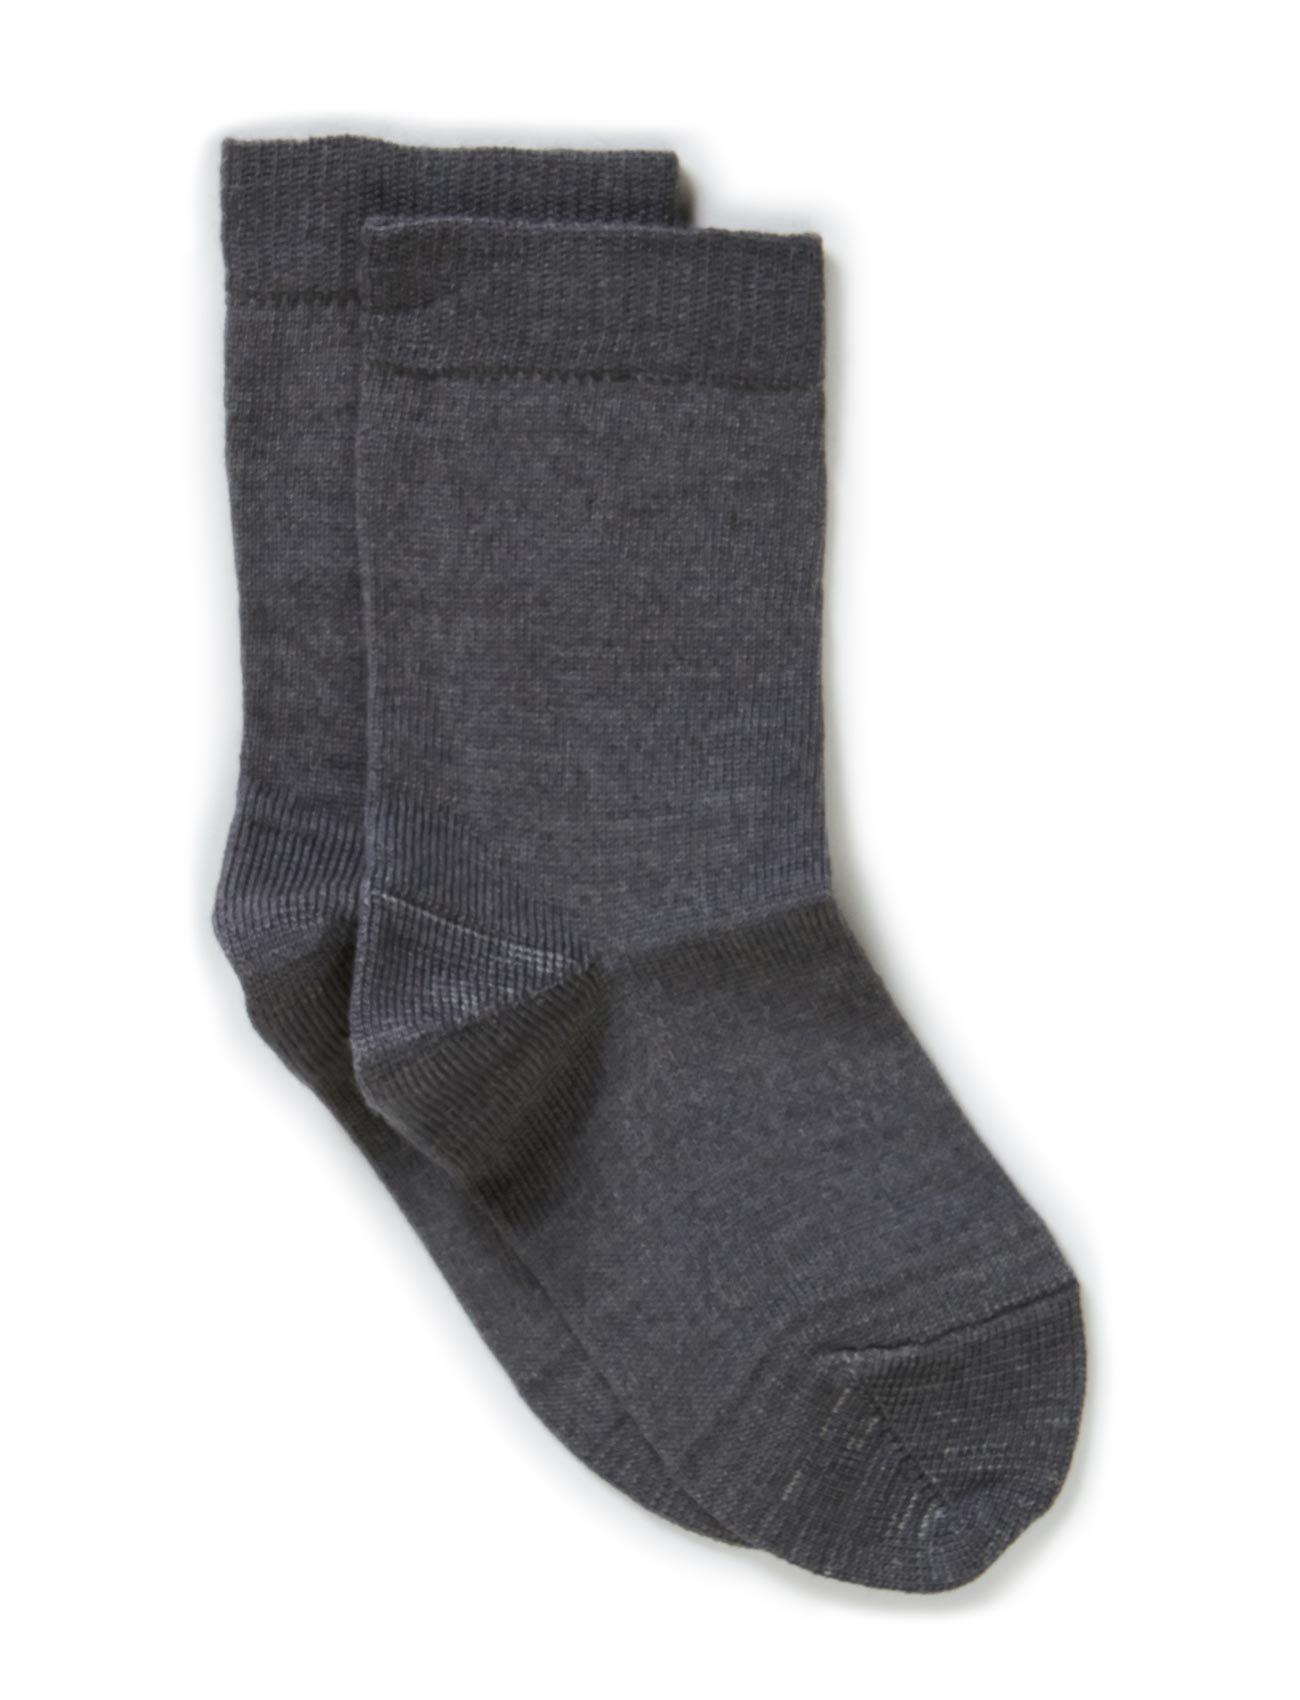 Melton Classic Superwash wool sock